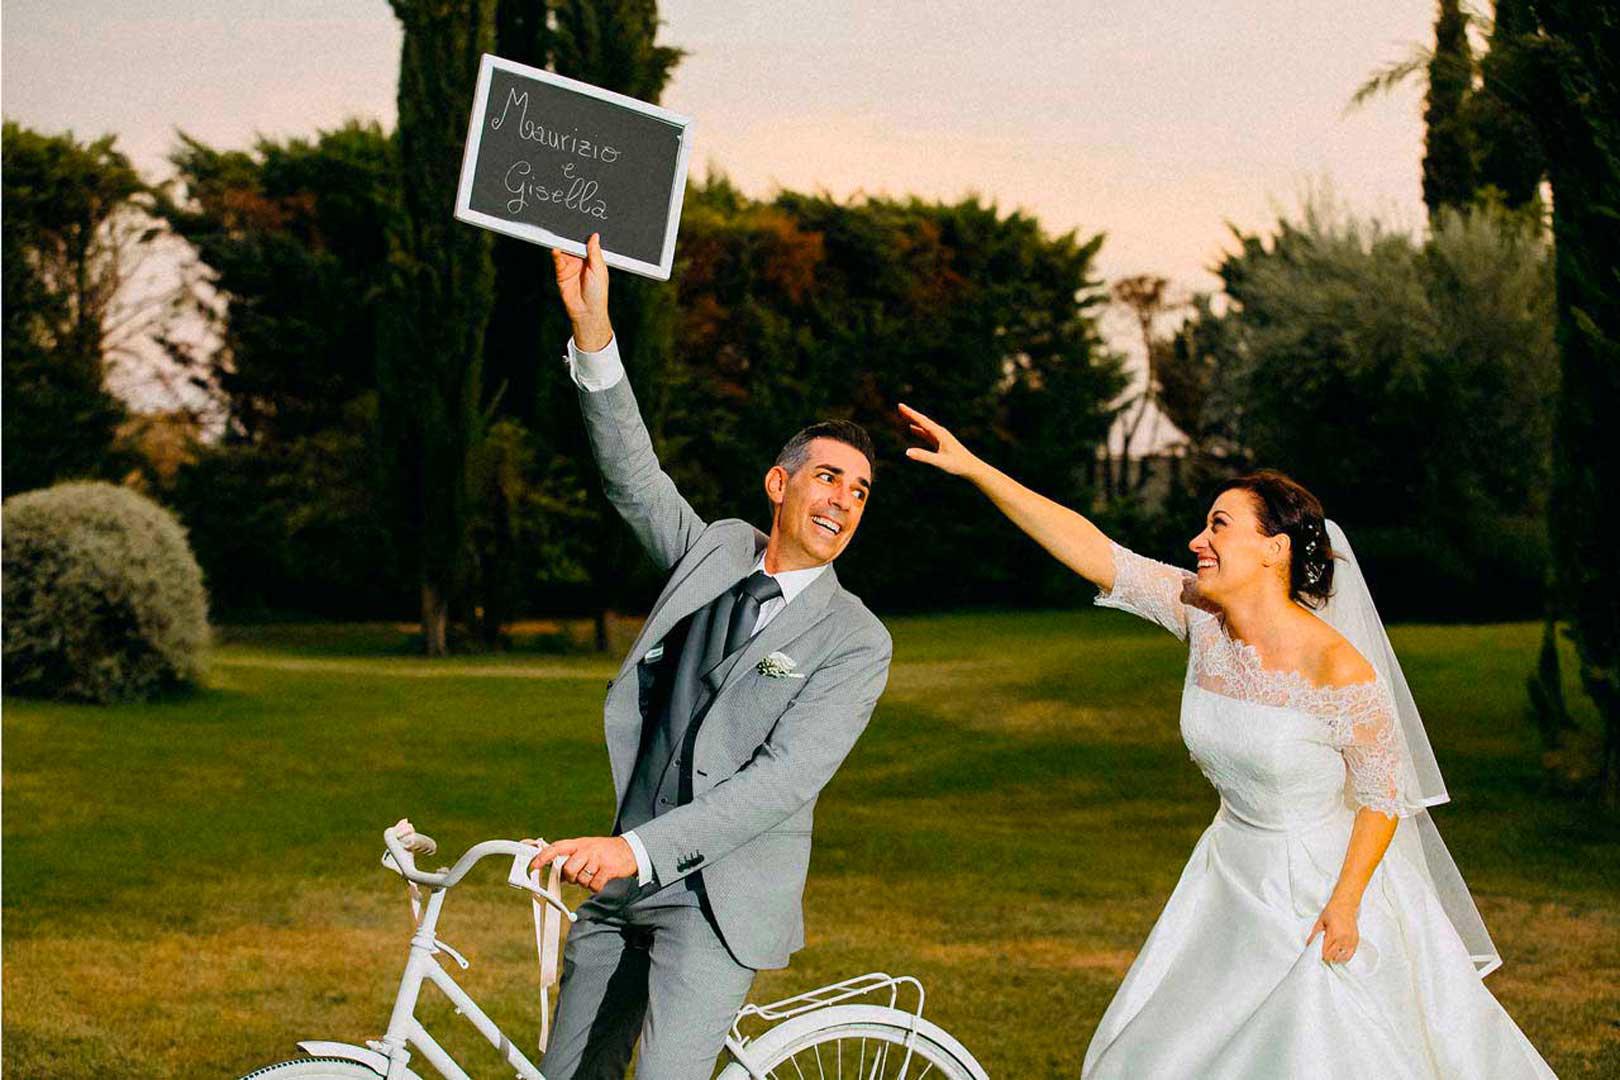 019-matrimonio-italiano-gianni-lepore-fotografo